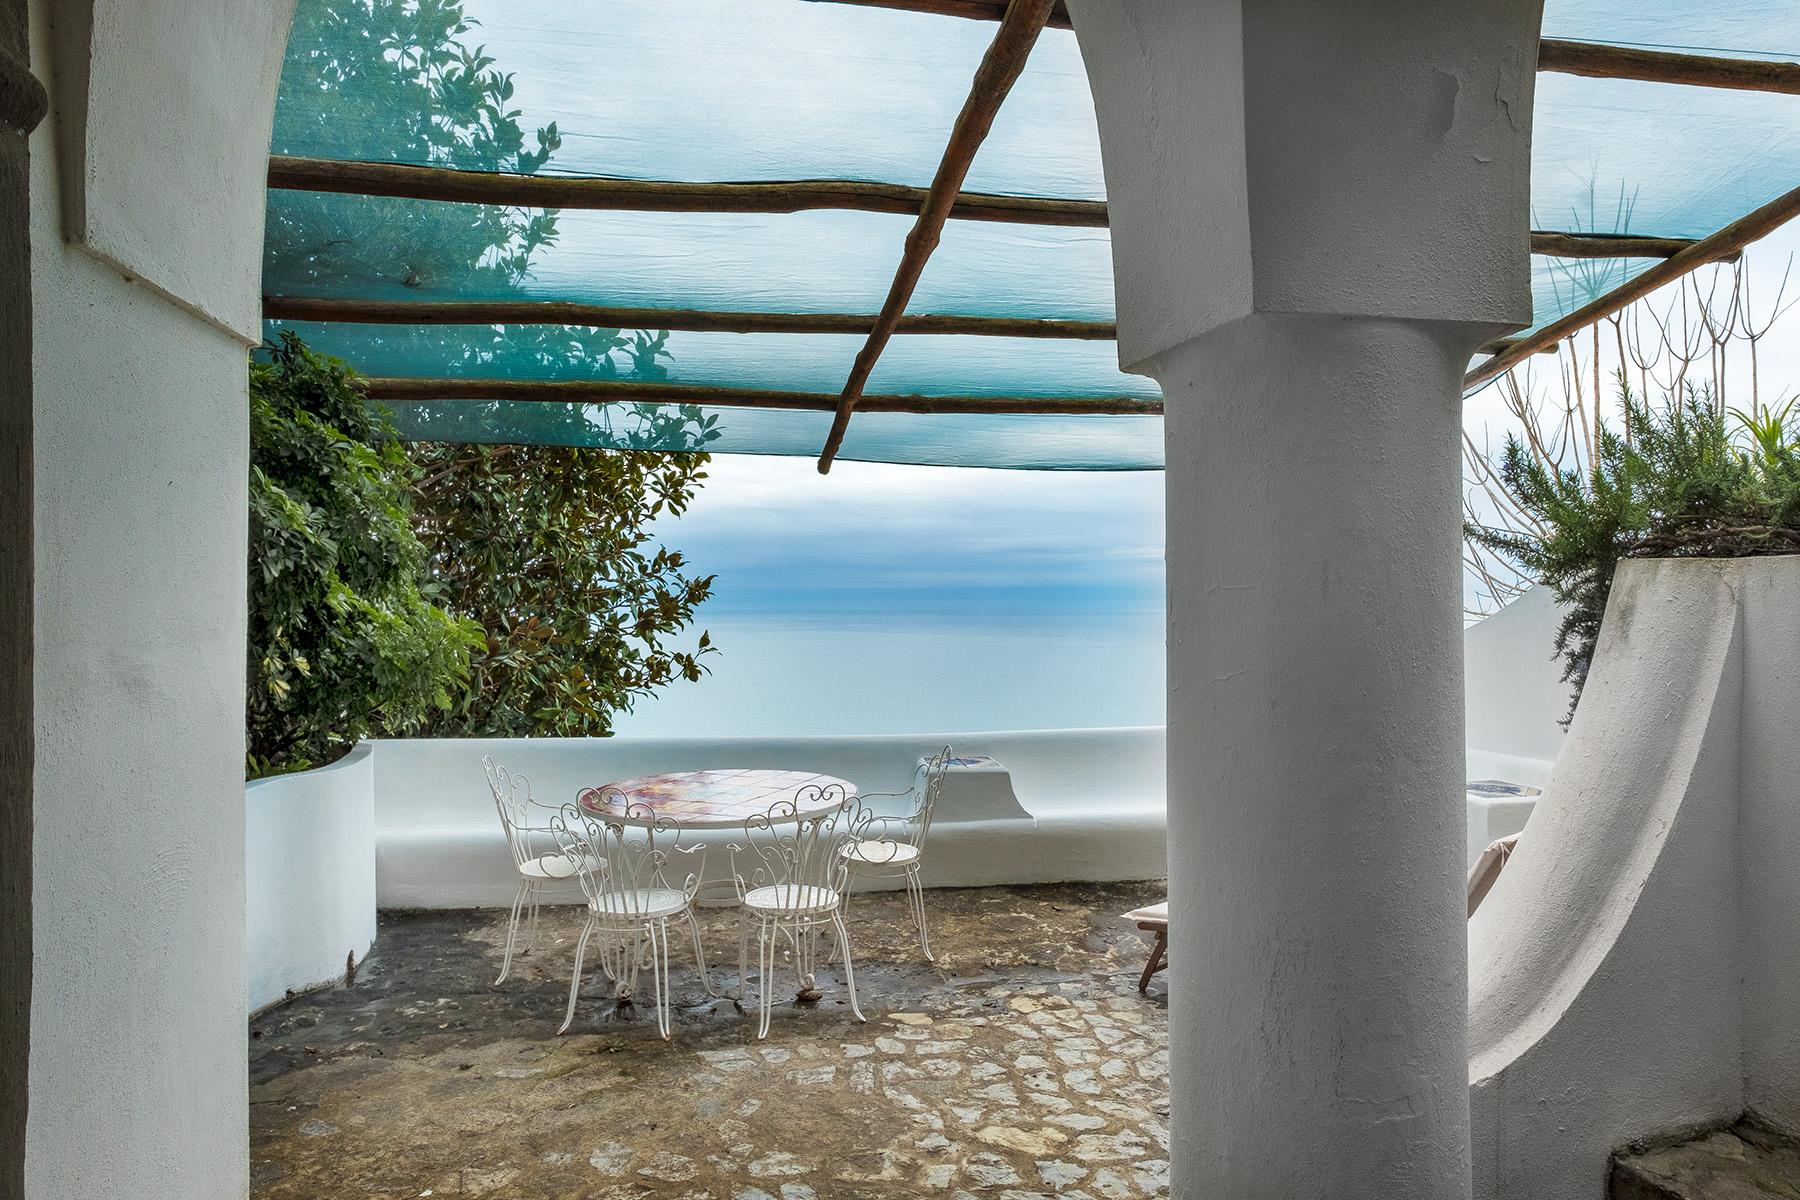 Casa indipendente in Vendita a Praiano: 4 locali, 250 mq - Foto 4